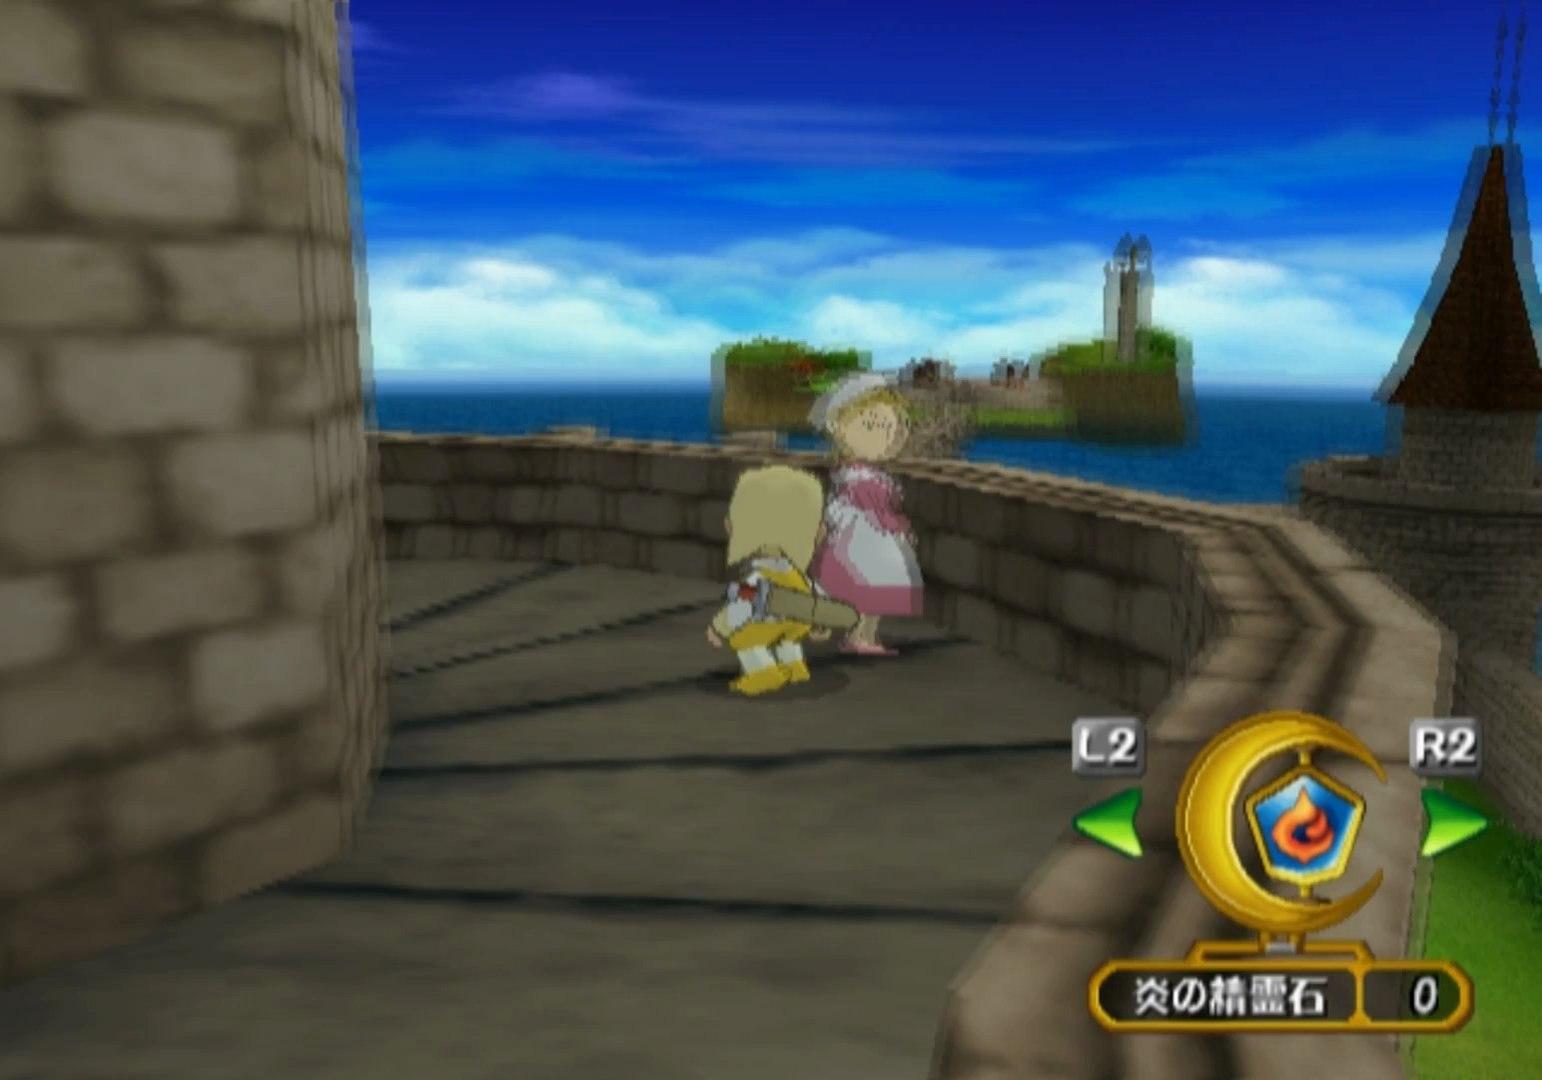 PoPoLoCrois Tsuki no Okite no Bouken Gameplay PCSX2 R5726 HD 1080p PS2